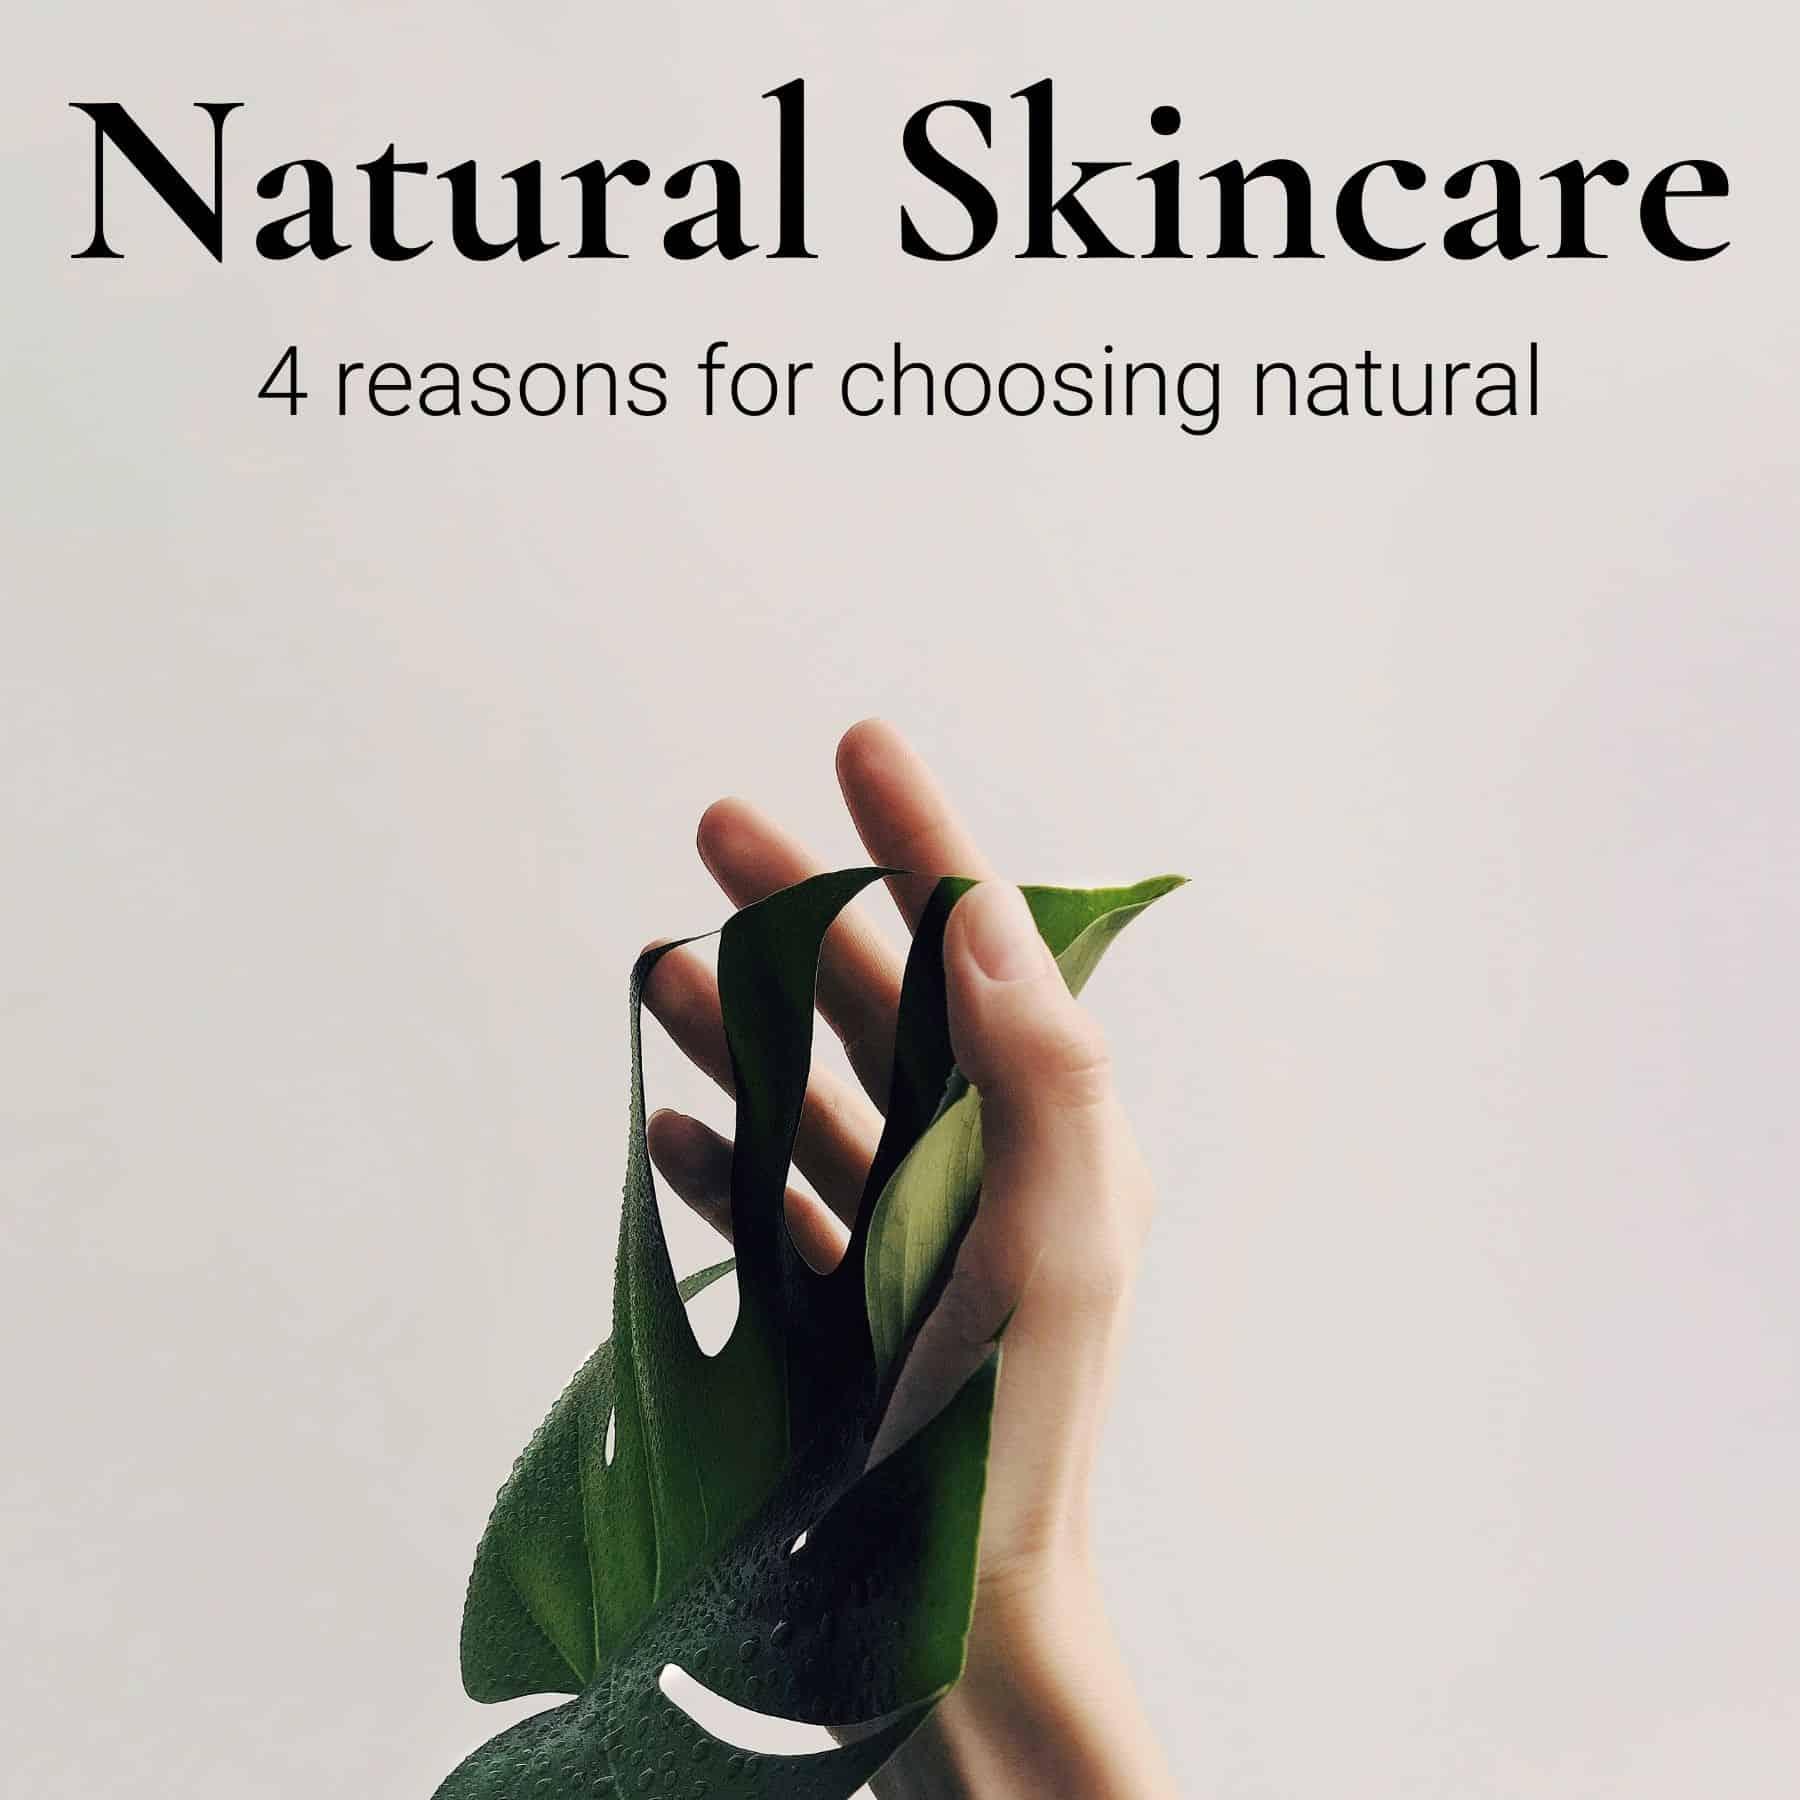 4 reasons to use natural skincare